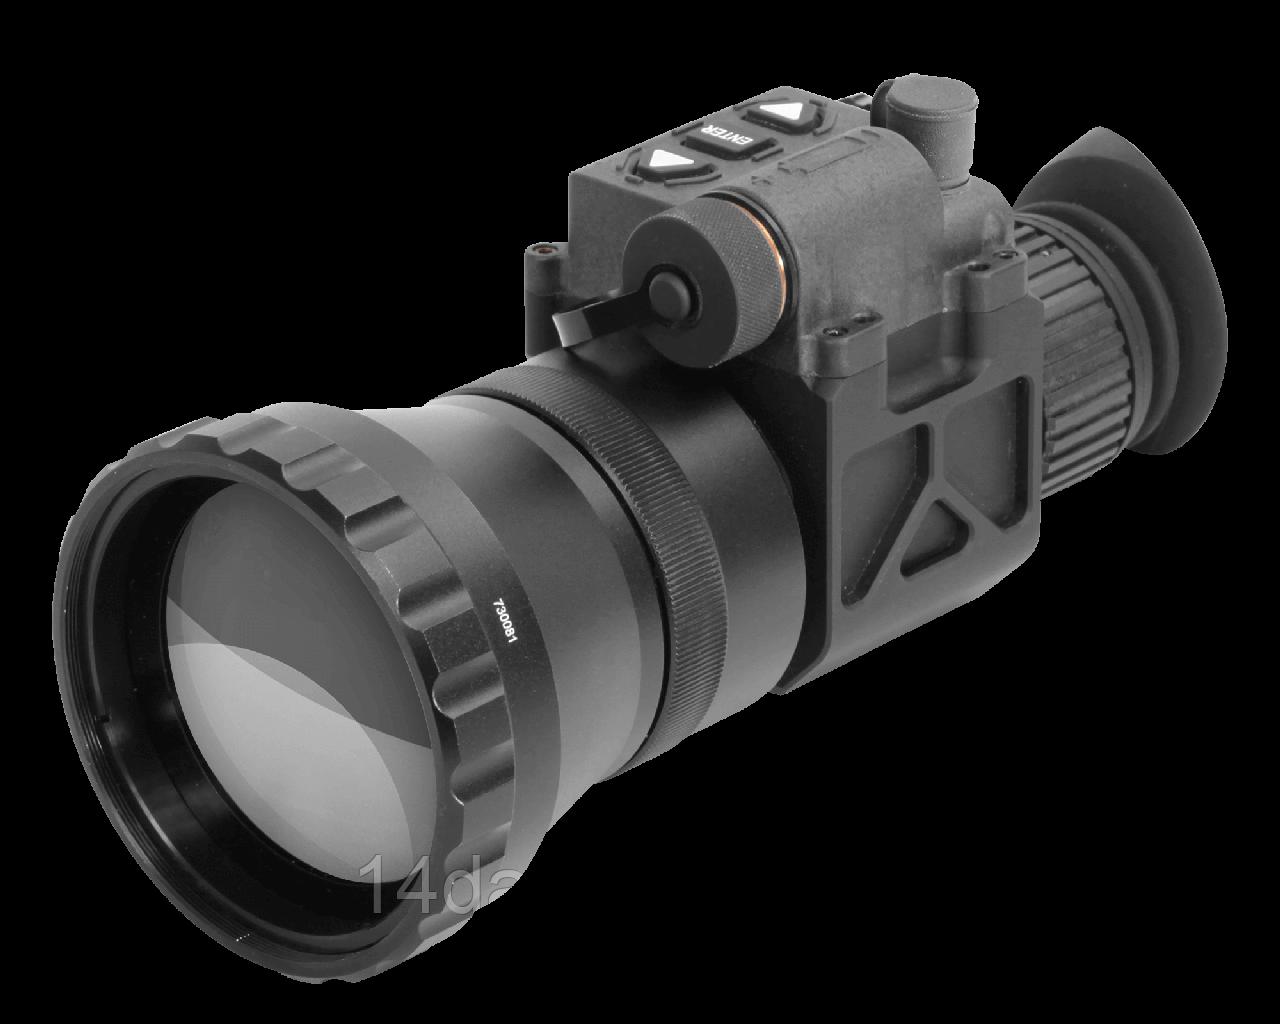 Тепловизор ATN OTS-X-S370